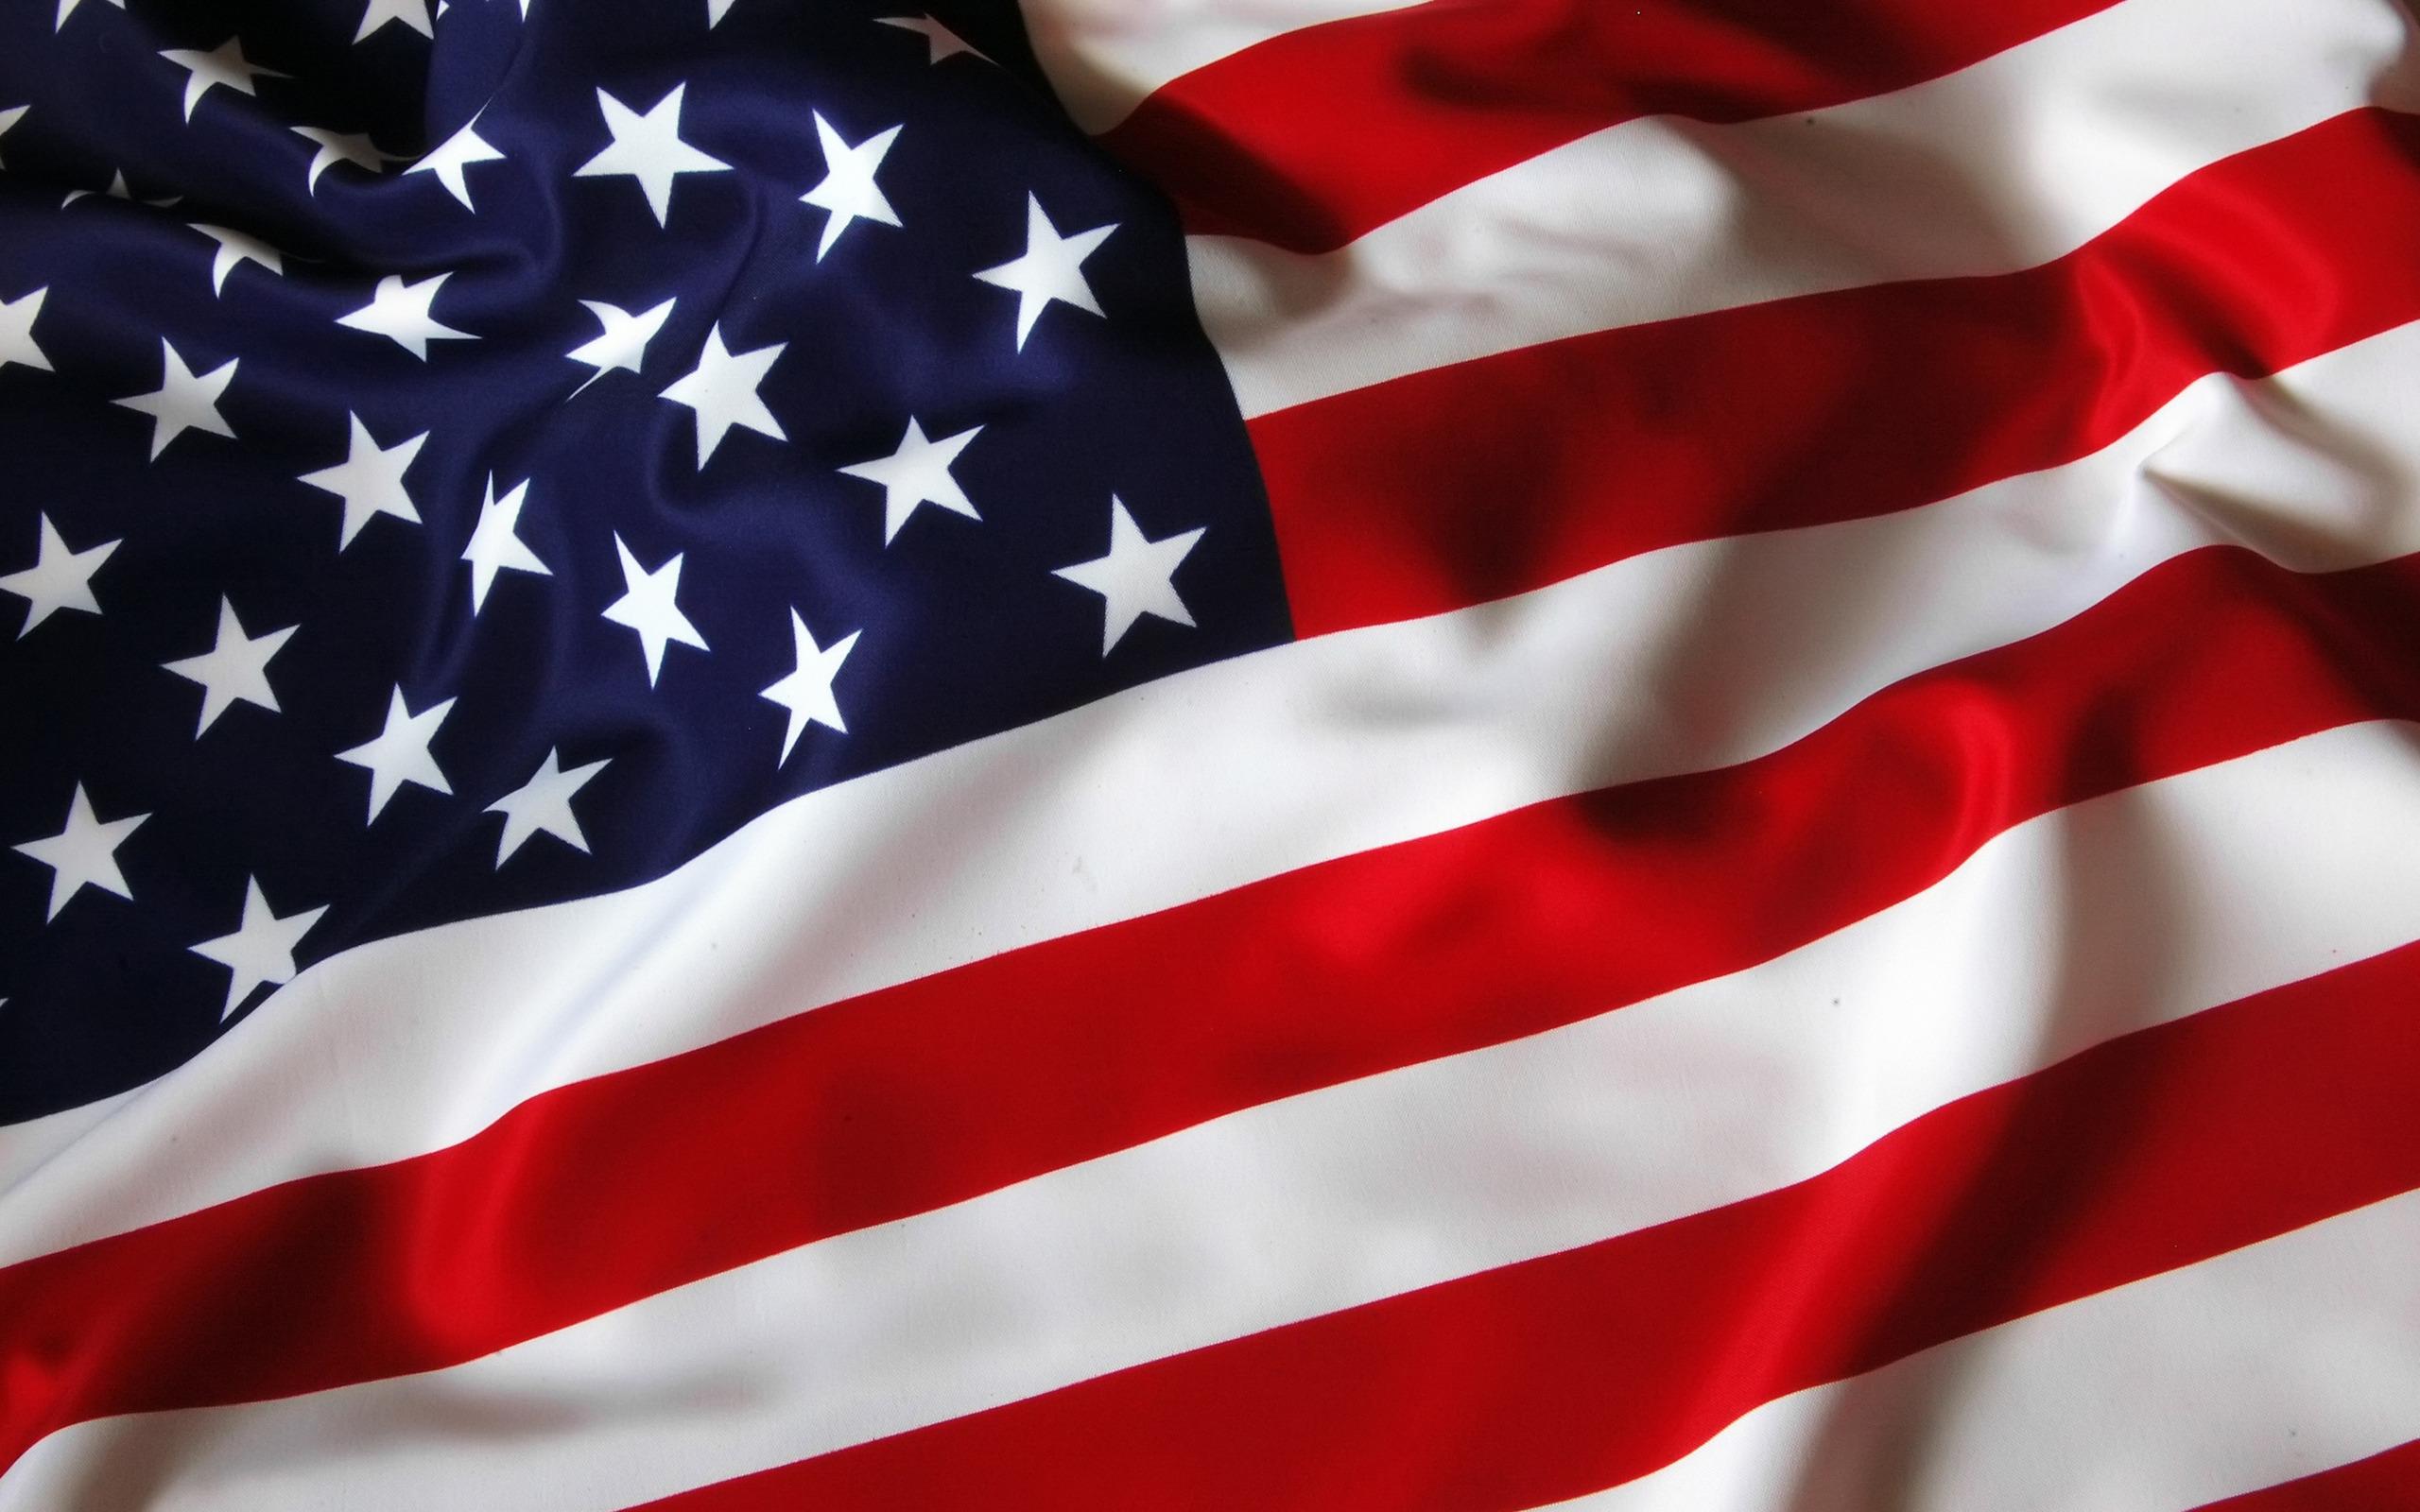 17296 Заставки и Обои Флаги на телефон. Скачать Флаги, Фон картинки бесплатно